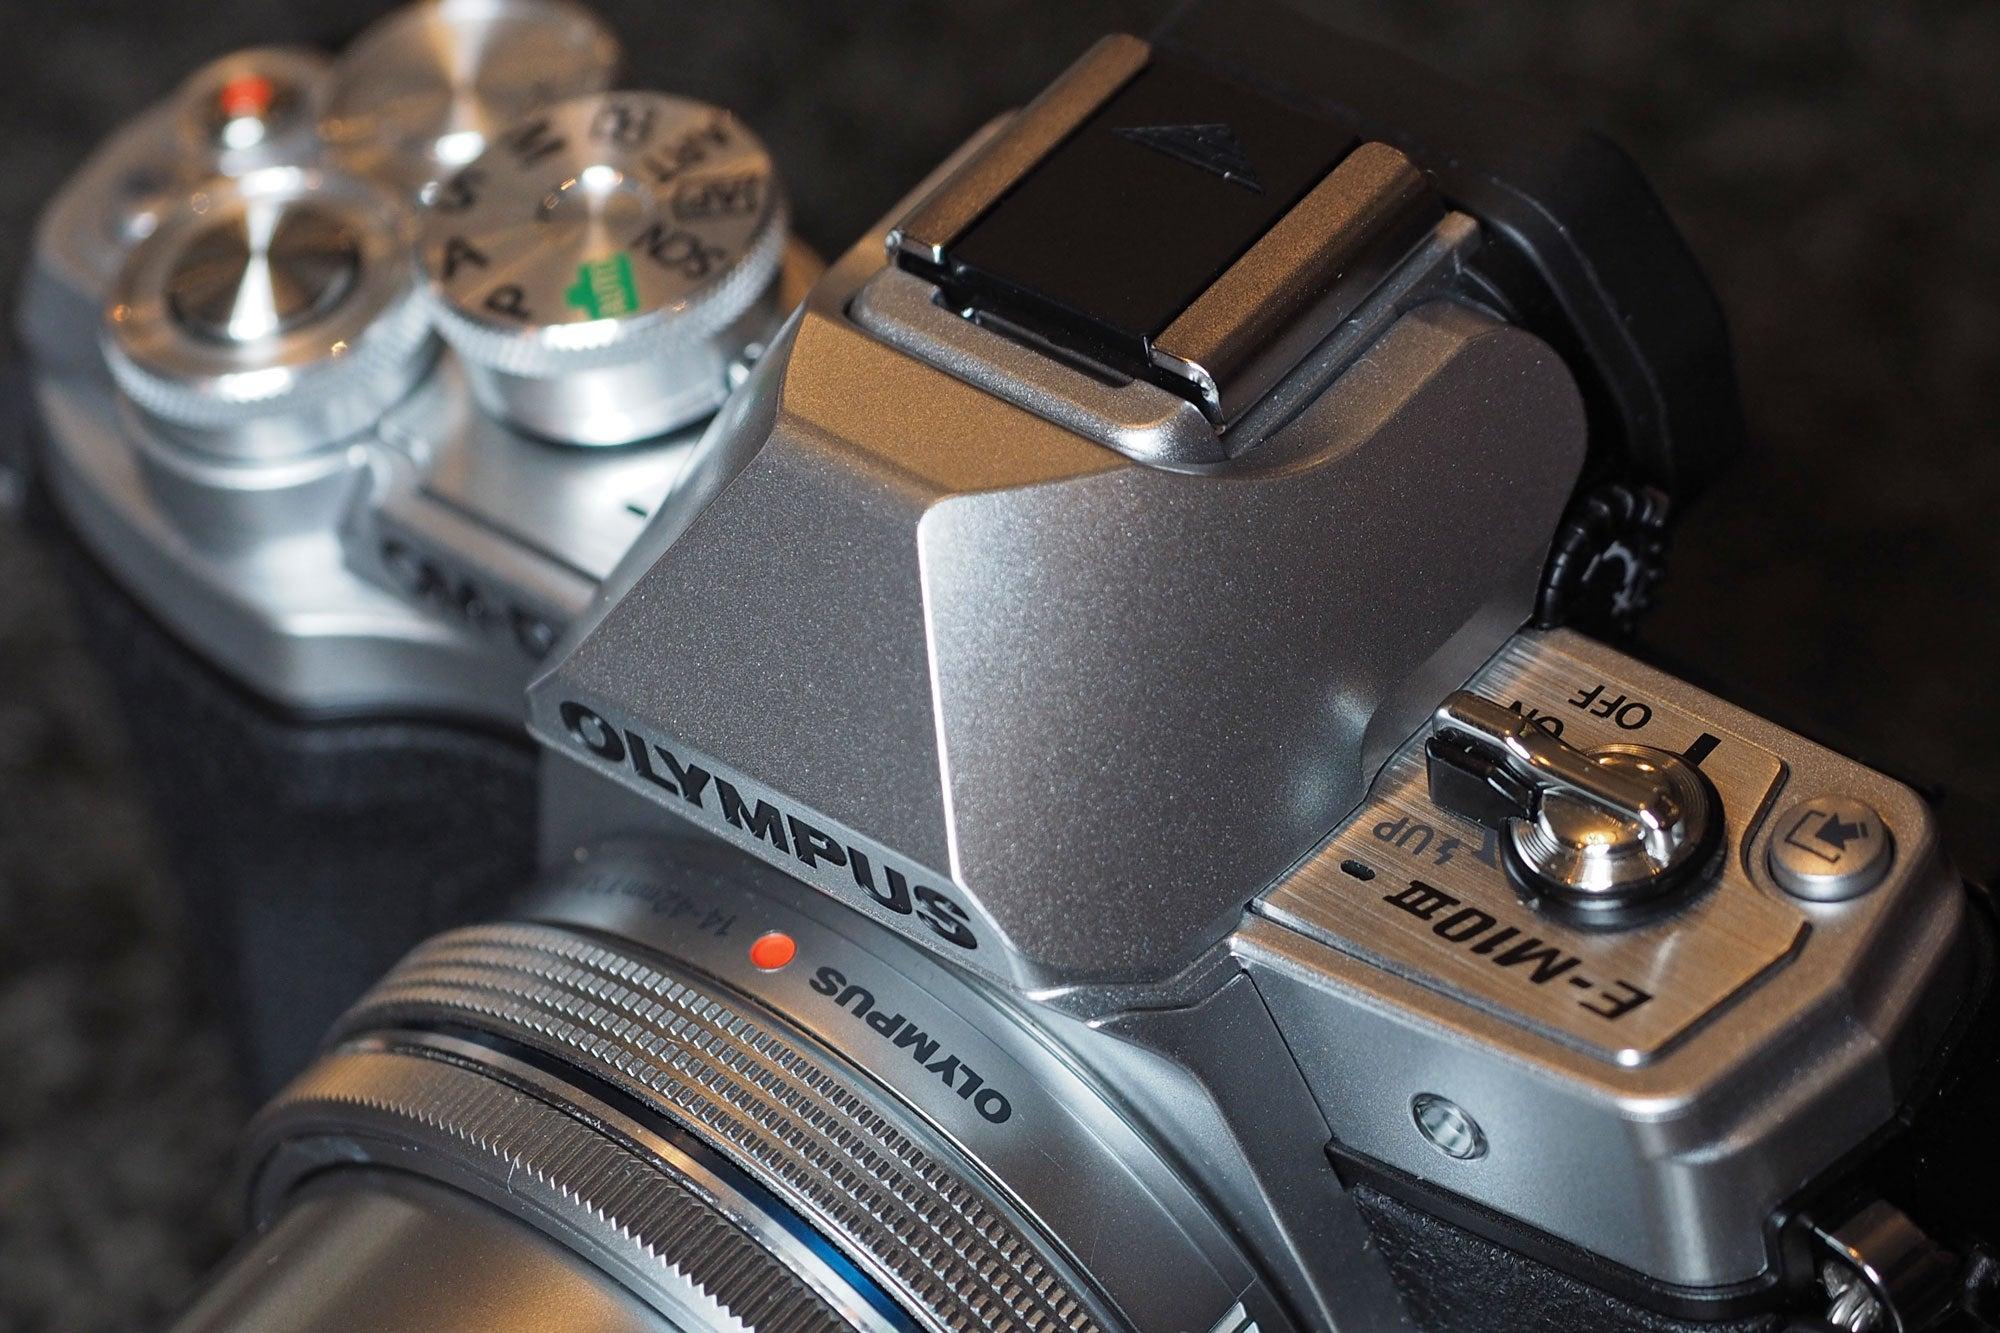 Jual Murah Cameras Olympus Update 2018 Om D E M10 Mark Ii Kit 40 150mm Paket Iii Review Trusted Reviews